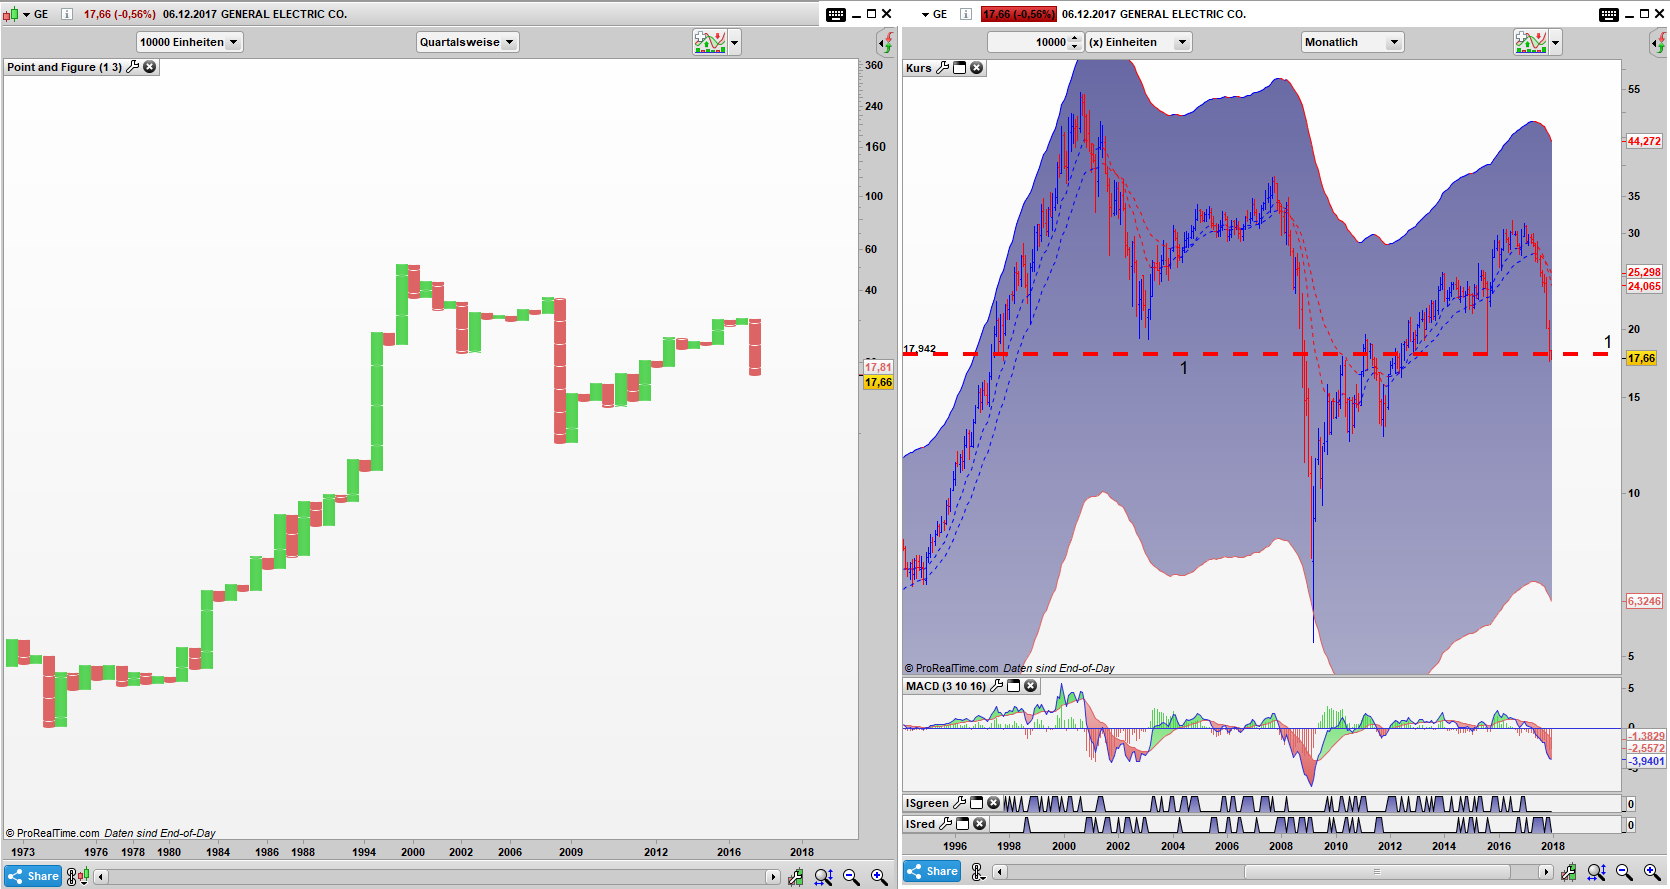 GE Point and Figure Quartals Chart, Bar Monats Chart: Ein grausames Chartbild